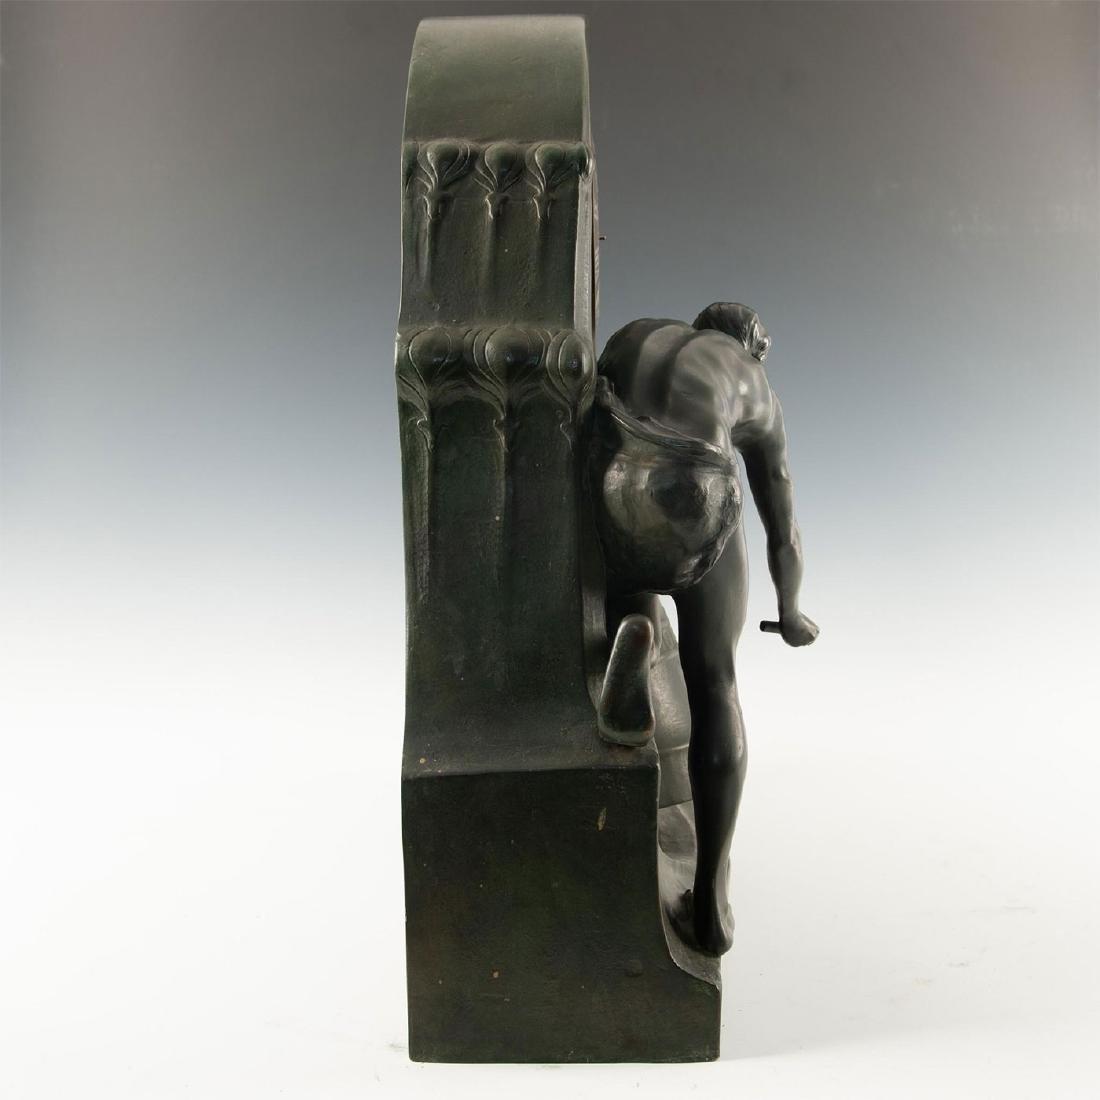 EARLY 20TH CENTURY ART NOUVEAU BRONZE CLOCK, AFTER - 6